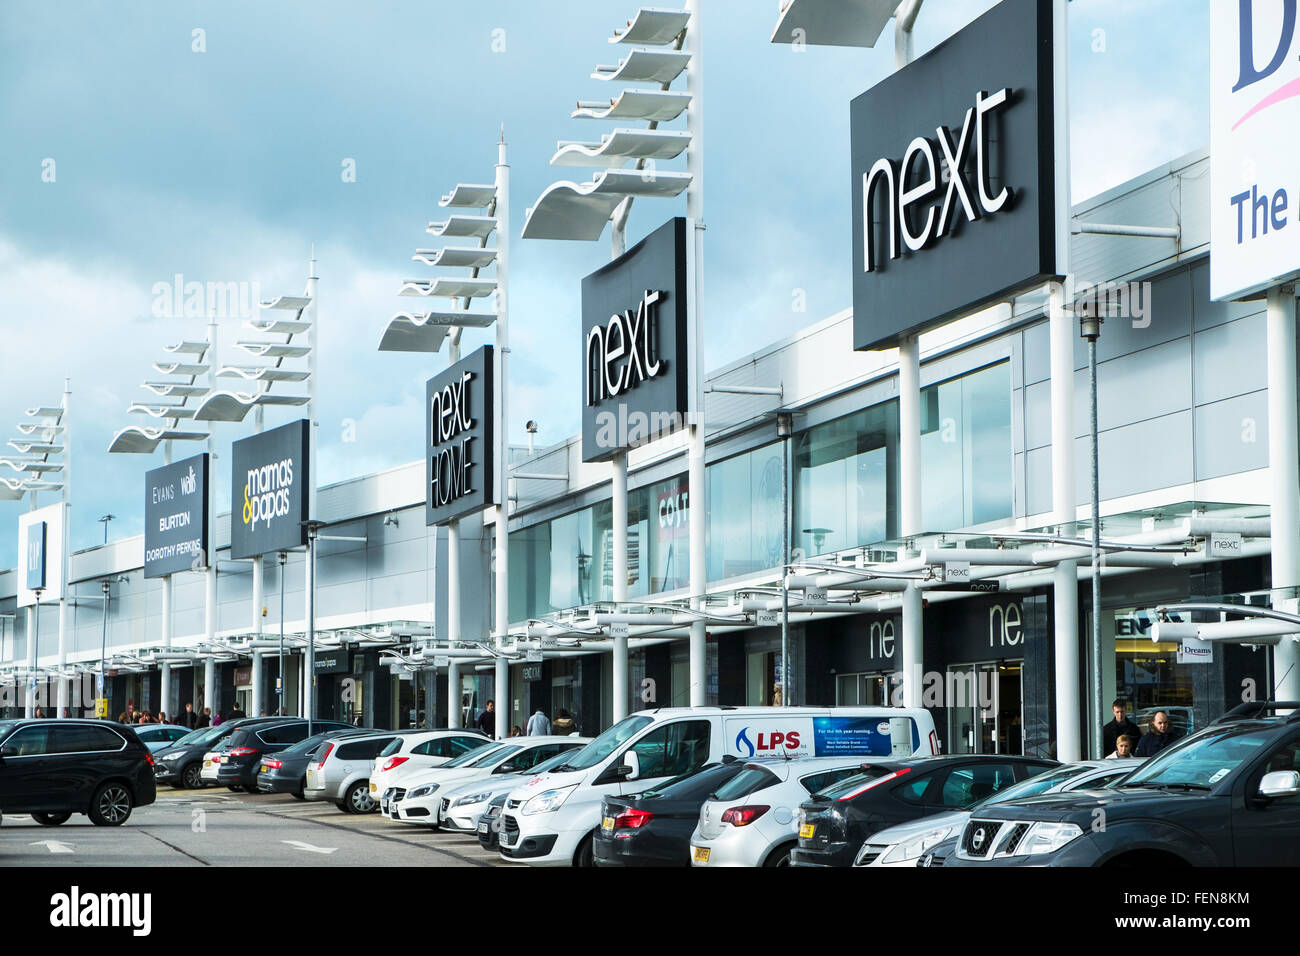 Birstall retail park Batley Leeds UK stores shops shopping centre center cars parked outside store shop - Stock Image